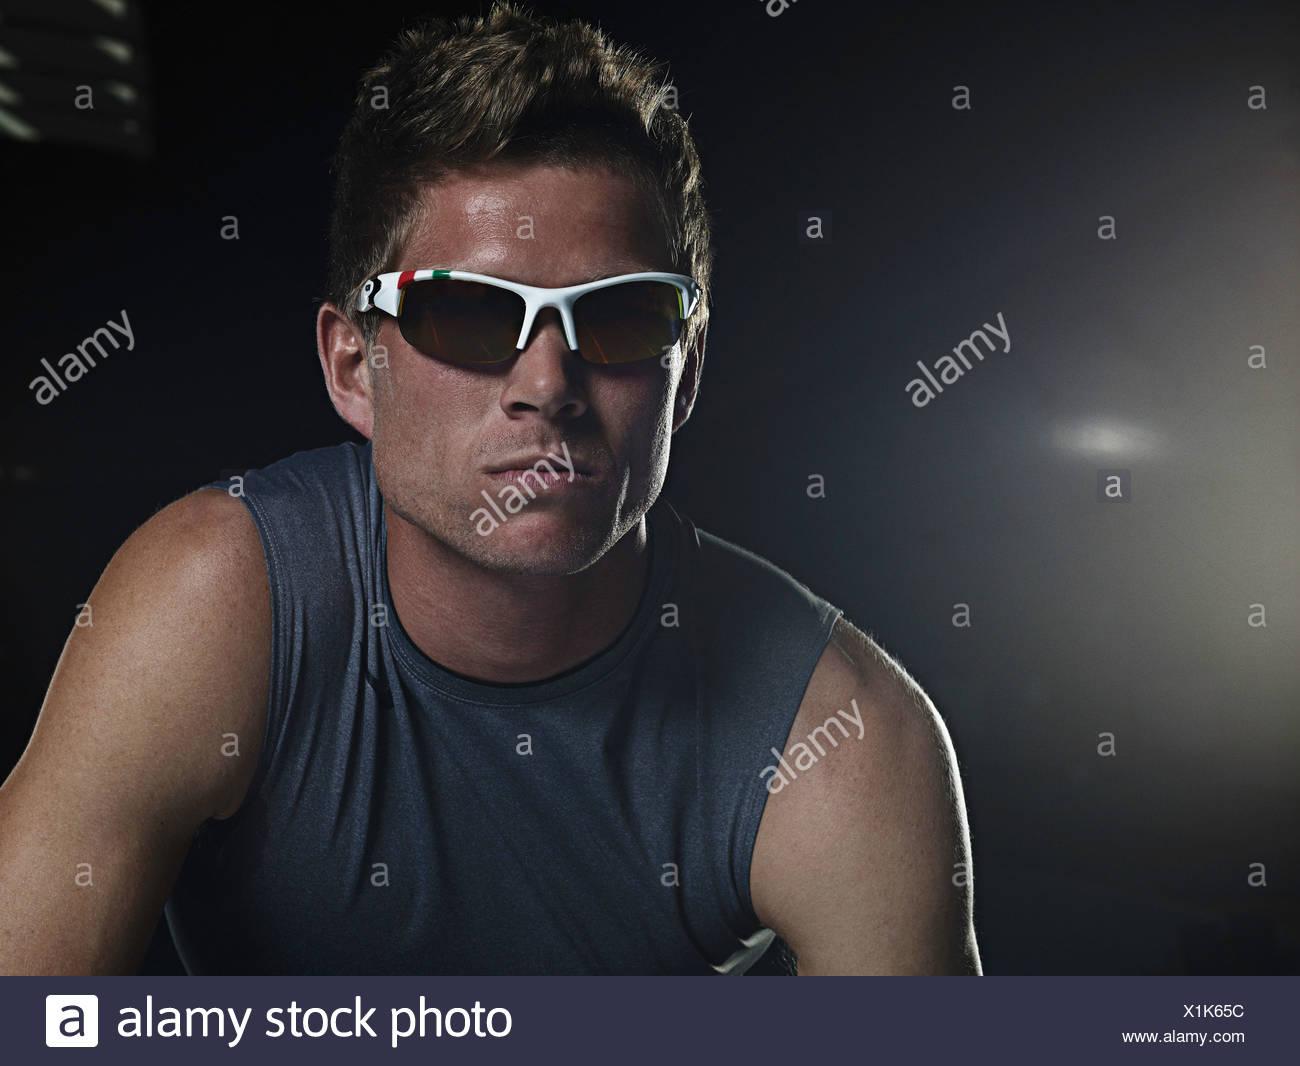 Runner in sunglasses at starting line Stock Photo